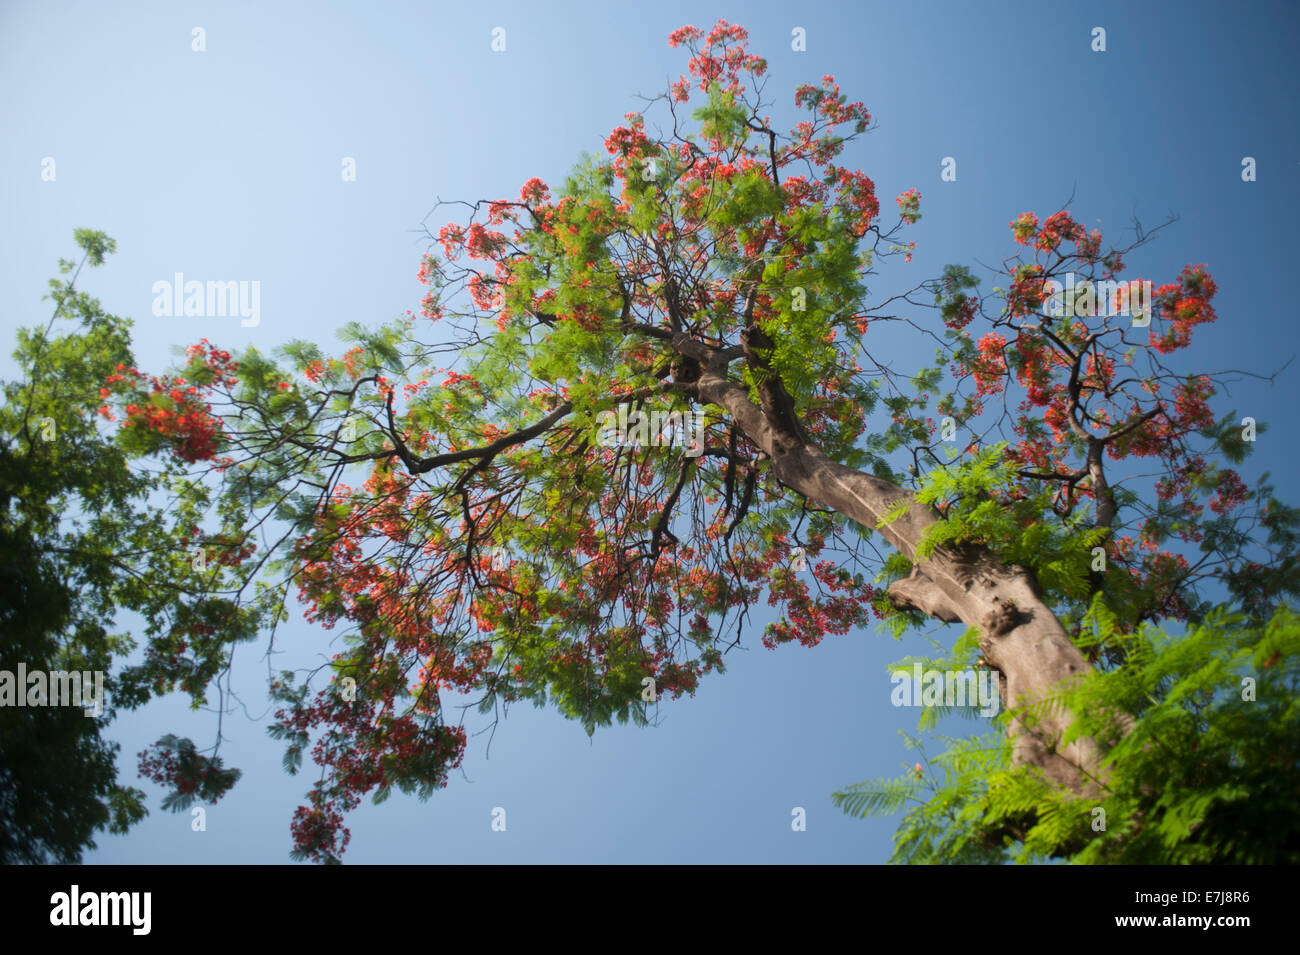 Flame tree  Delonix regia, Fabaceae,  Madagascar, Africa - Stock Image